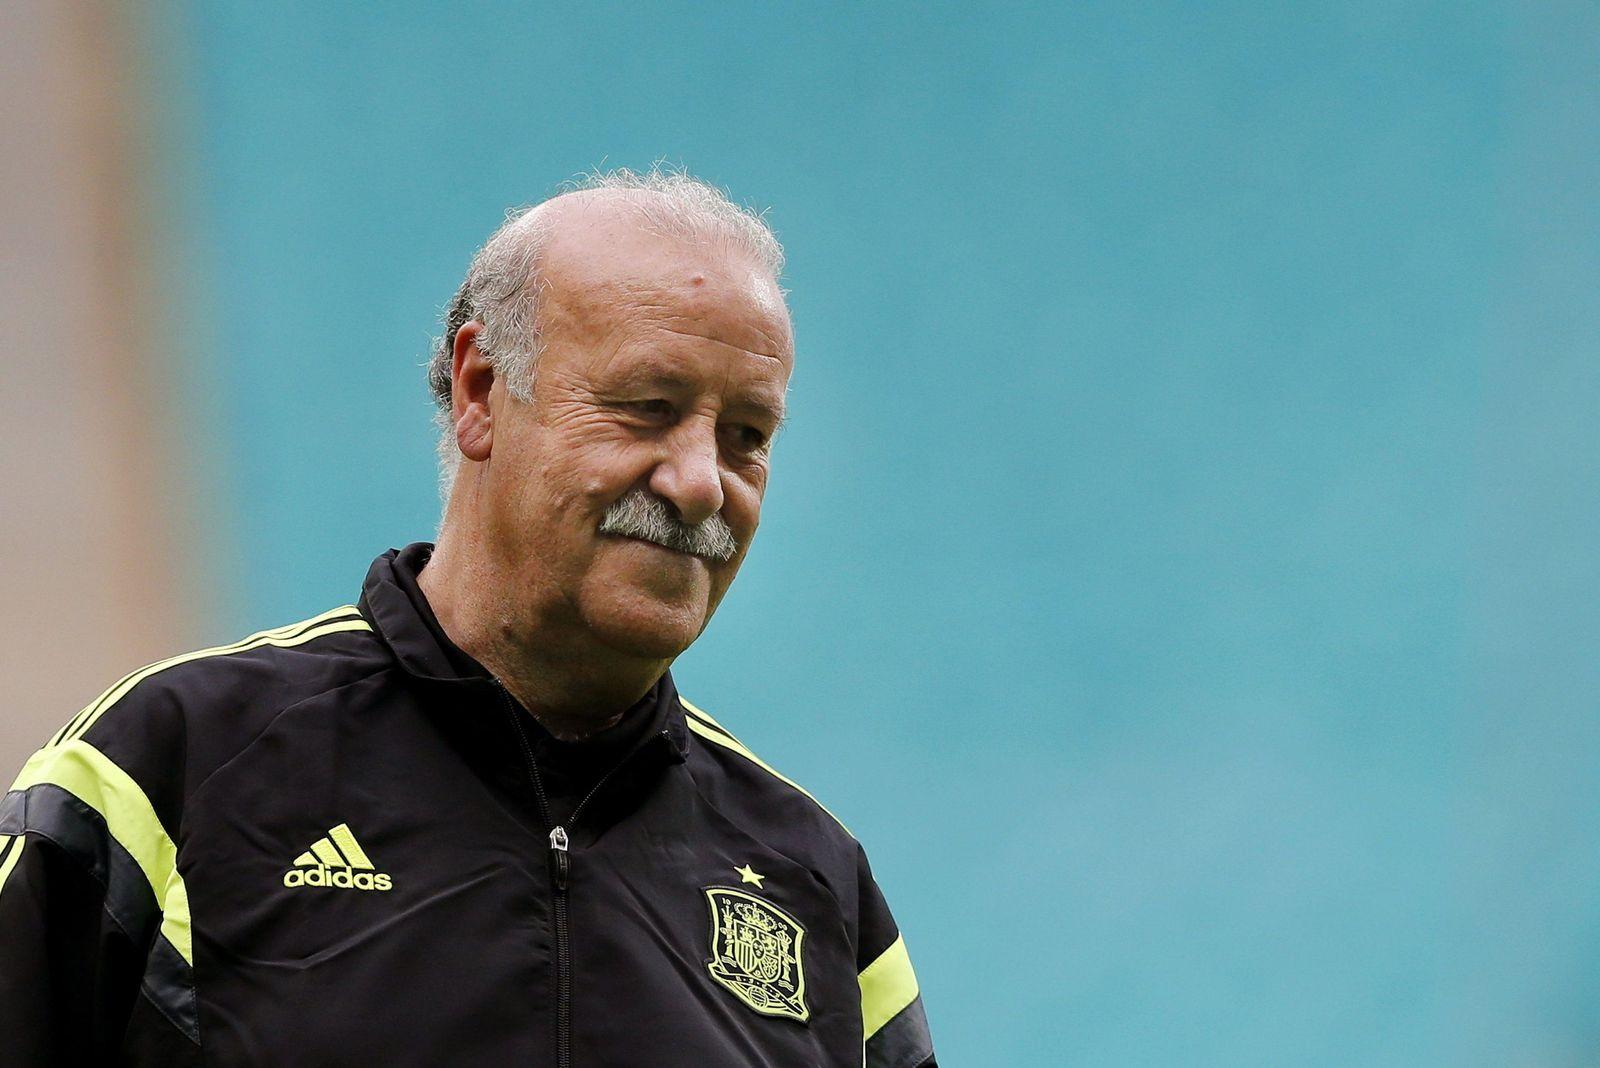 World Cup 2014 - Spain training